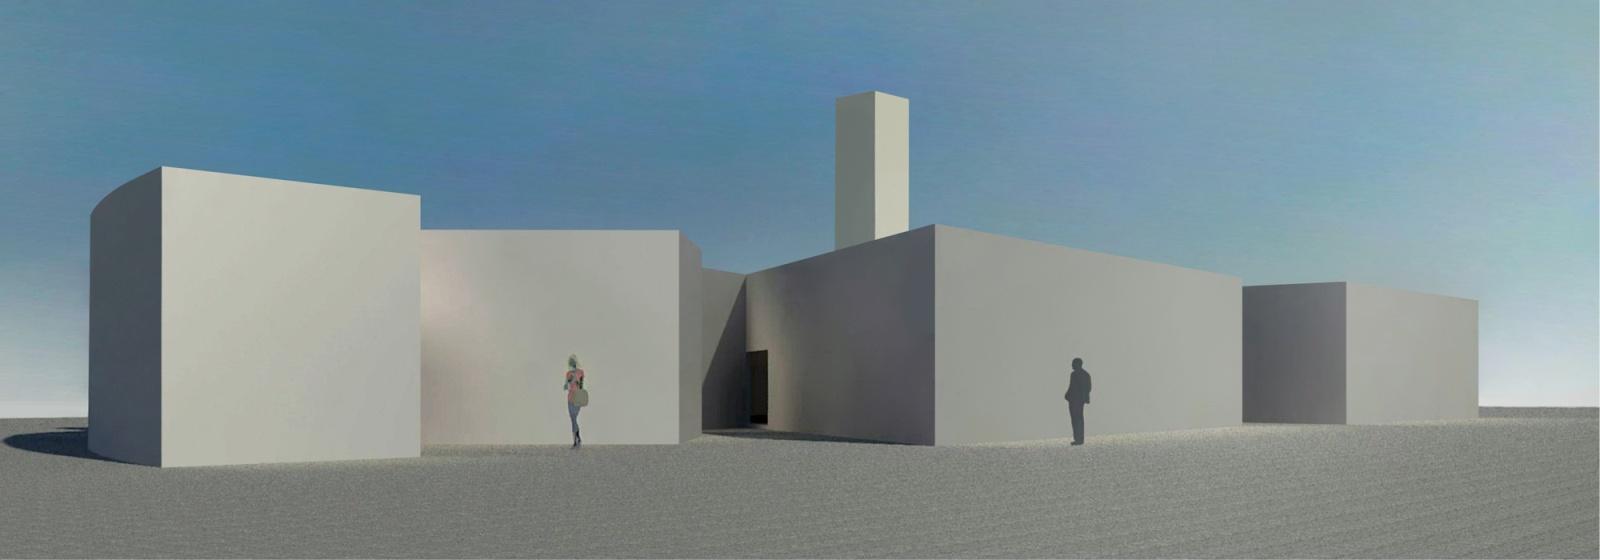 The Siza Pavilion